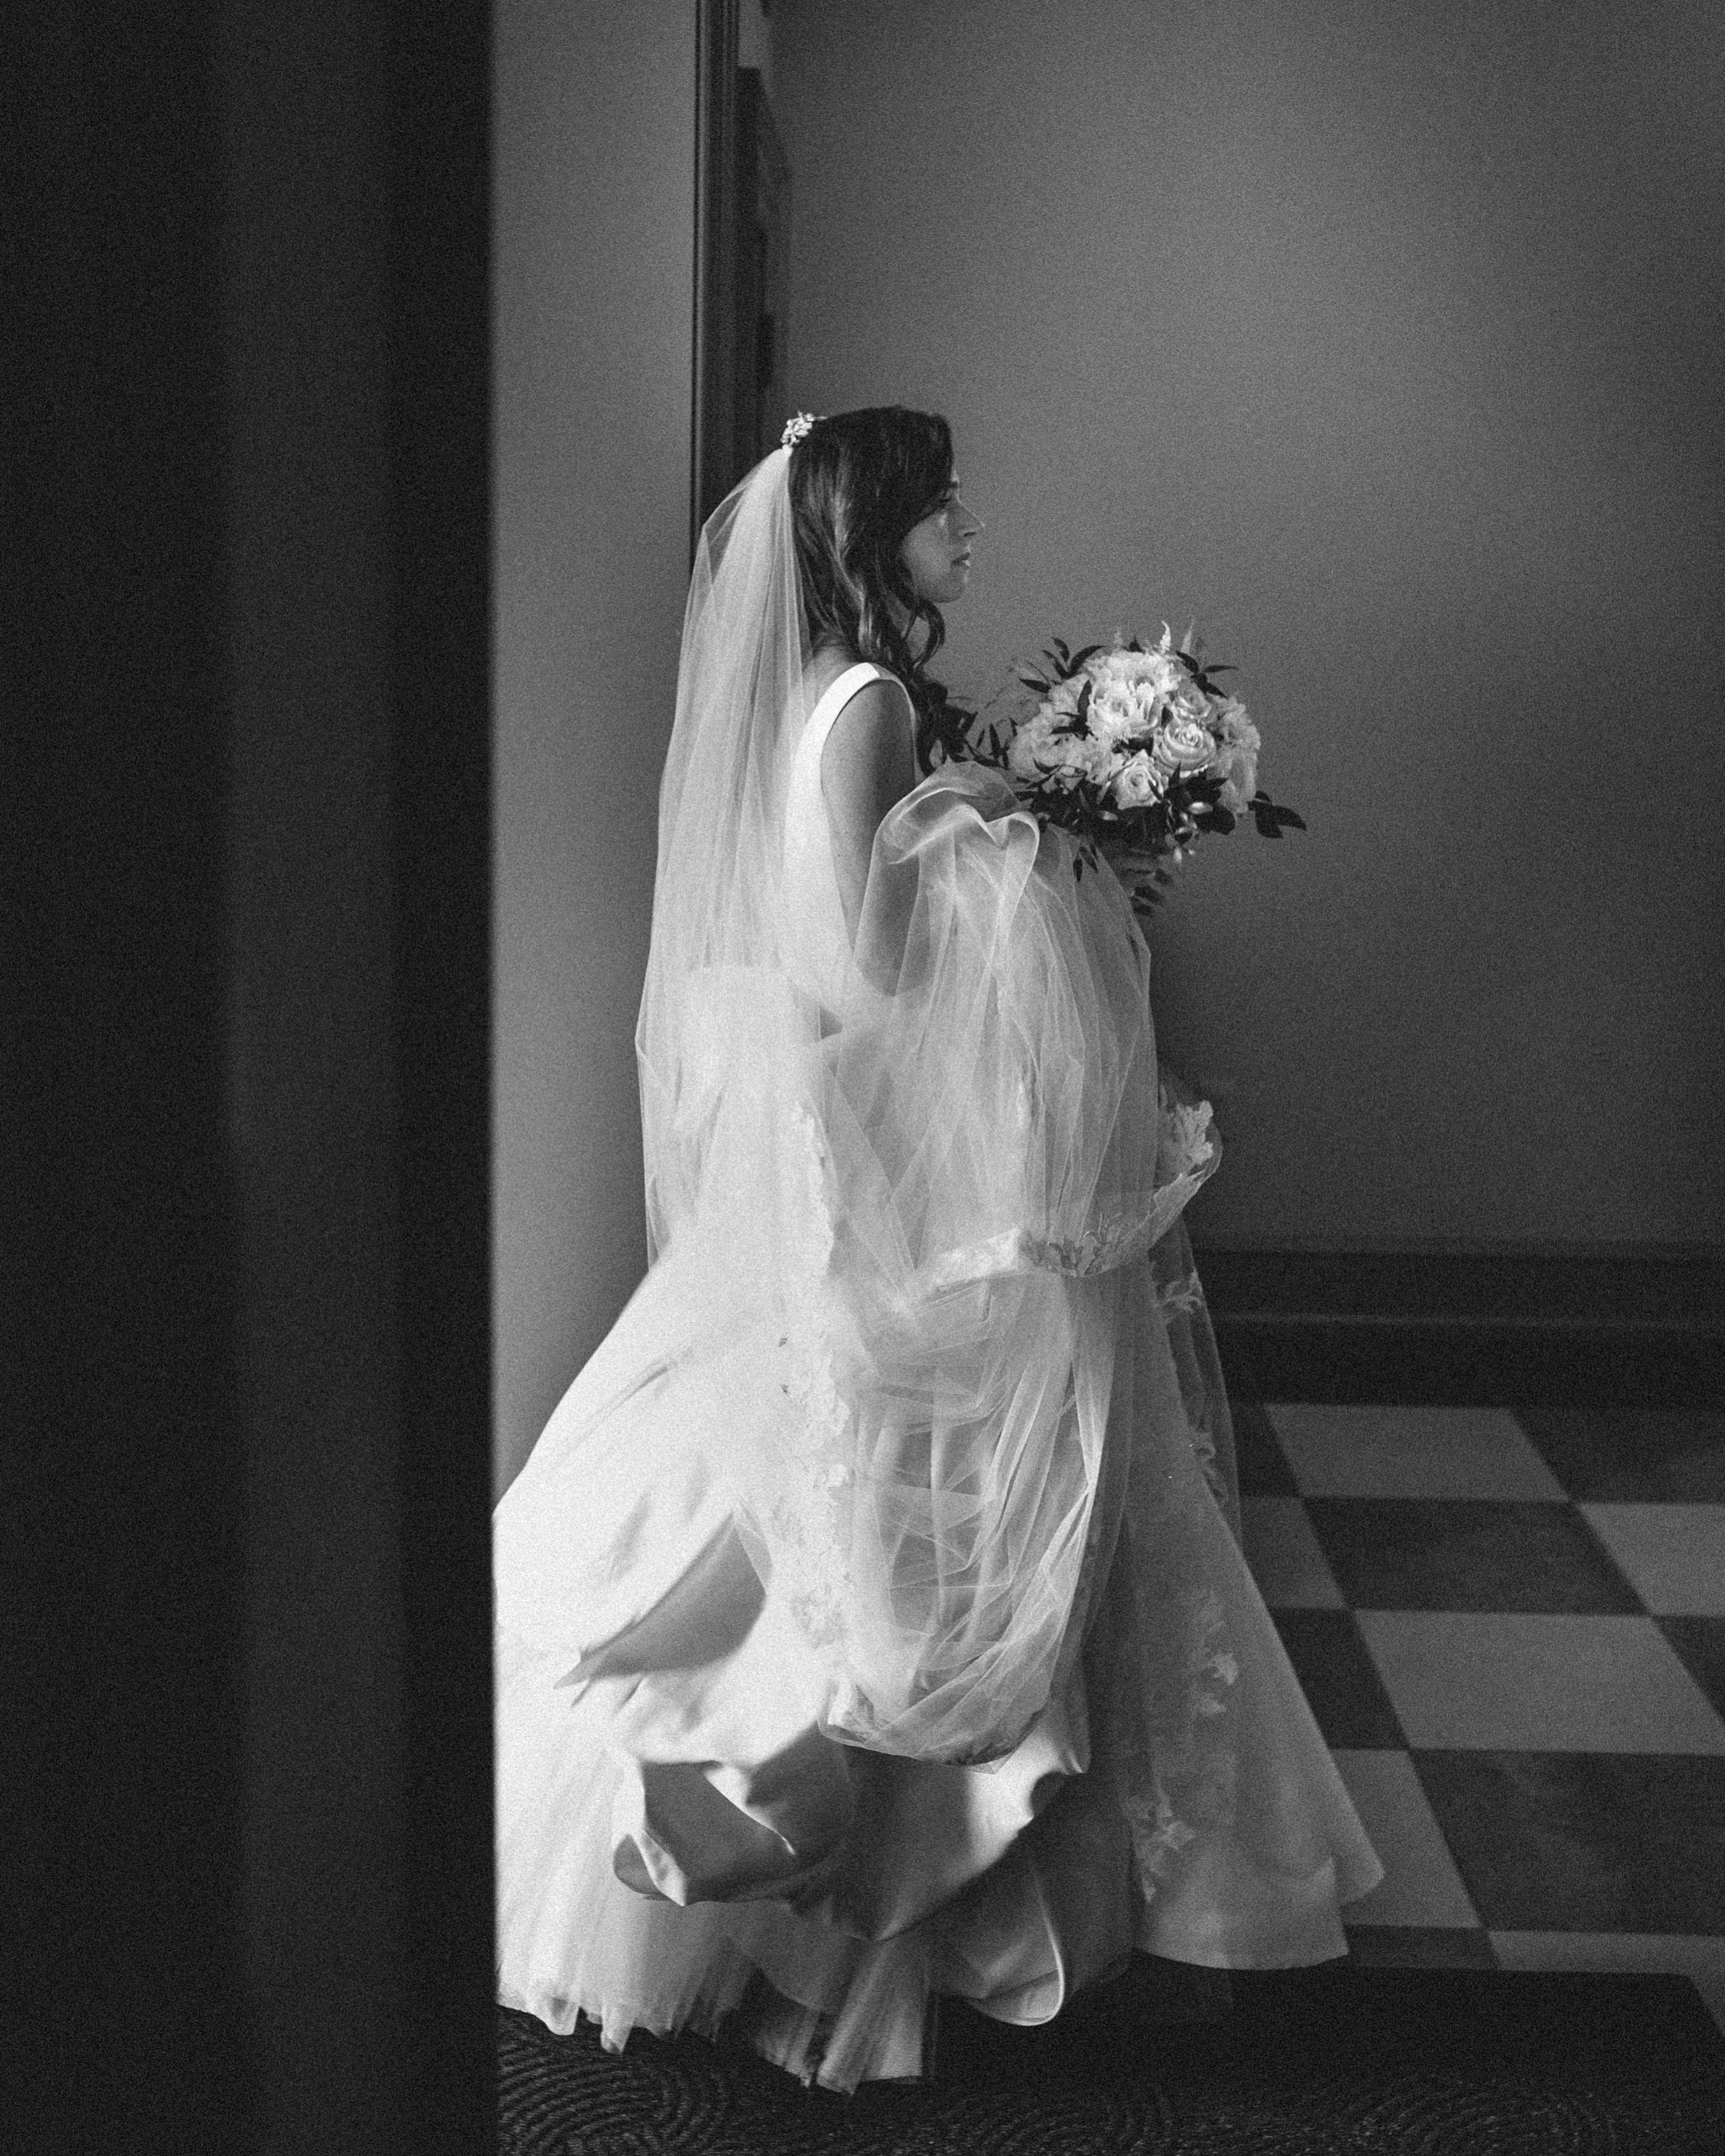 rumson-tented-wedding-nj-maine-conneticut-classic_0016.jpg